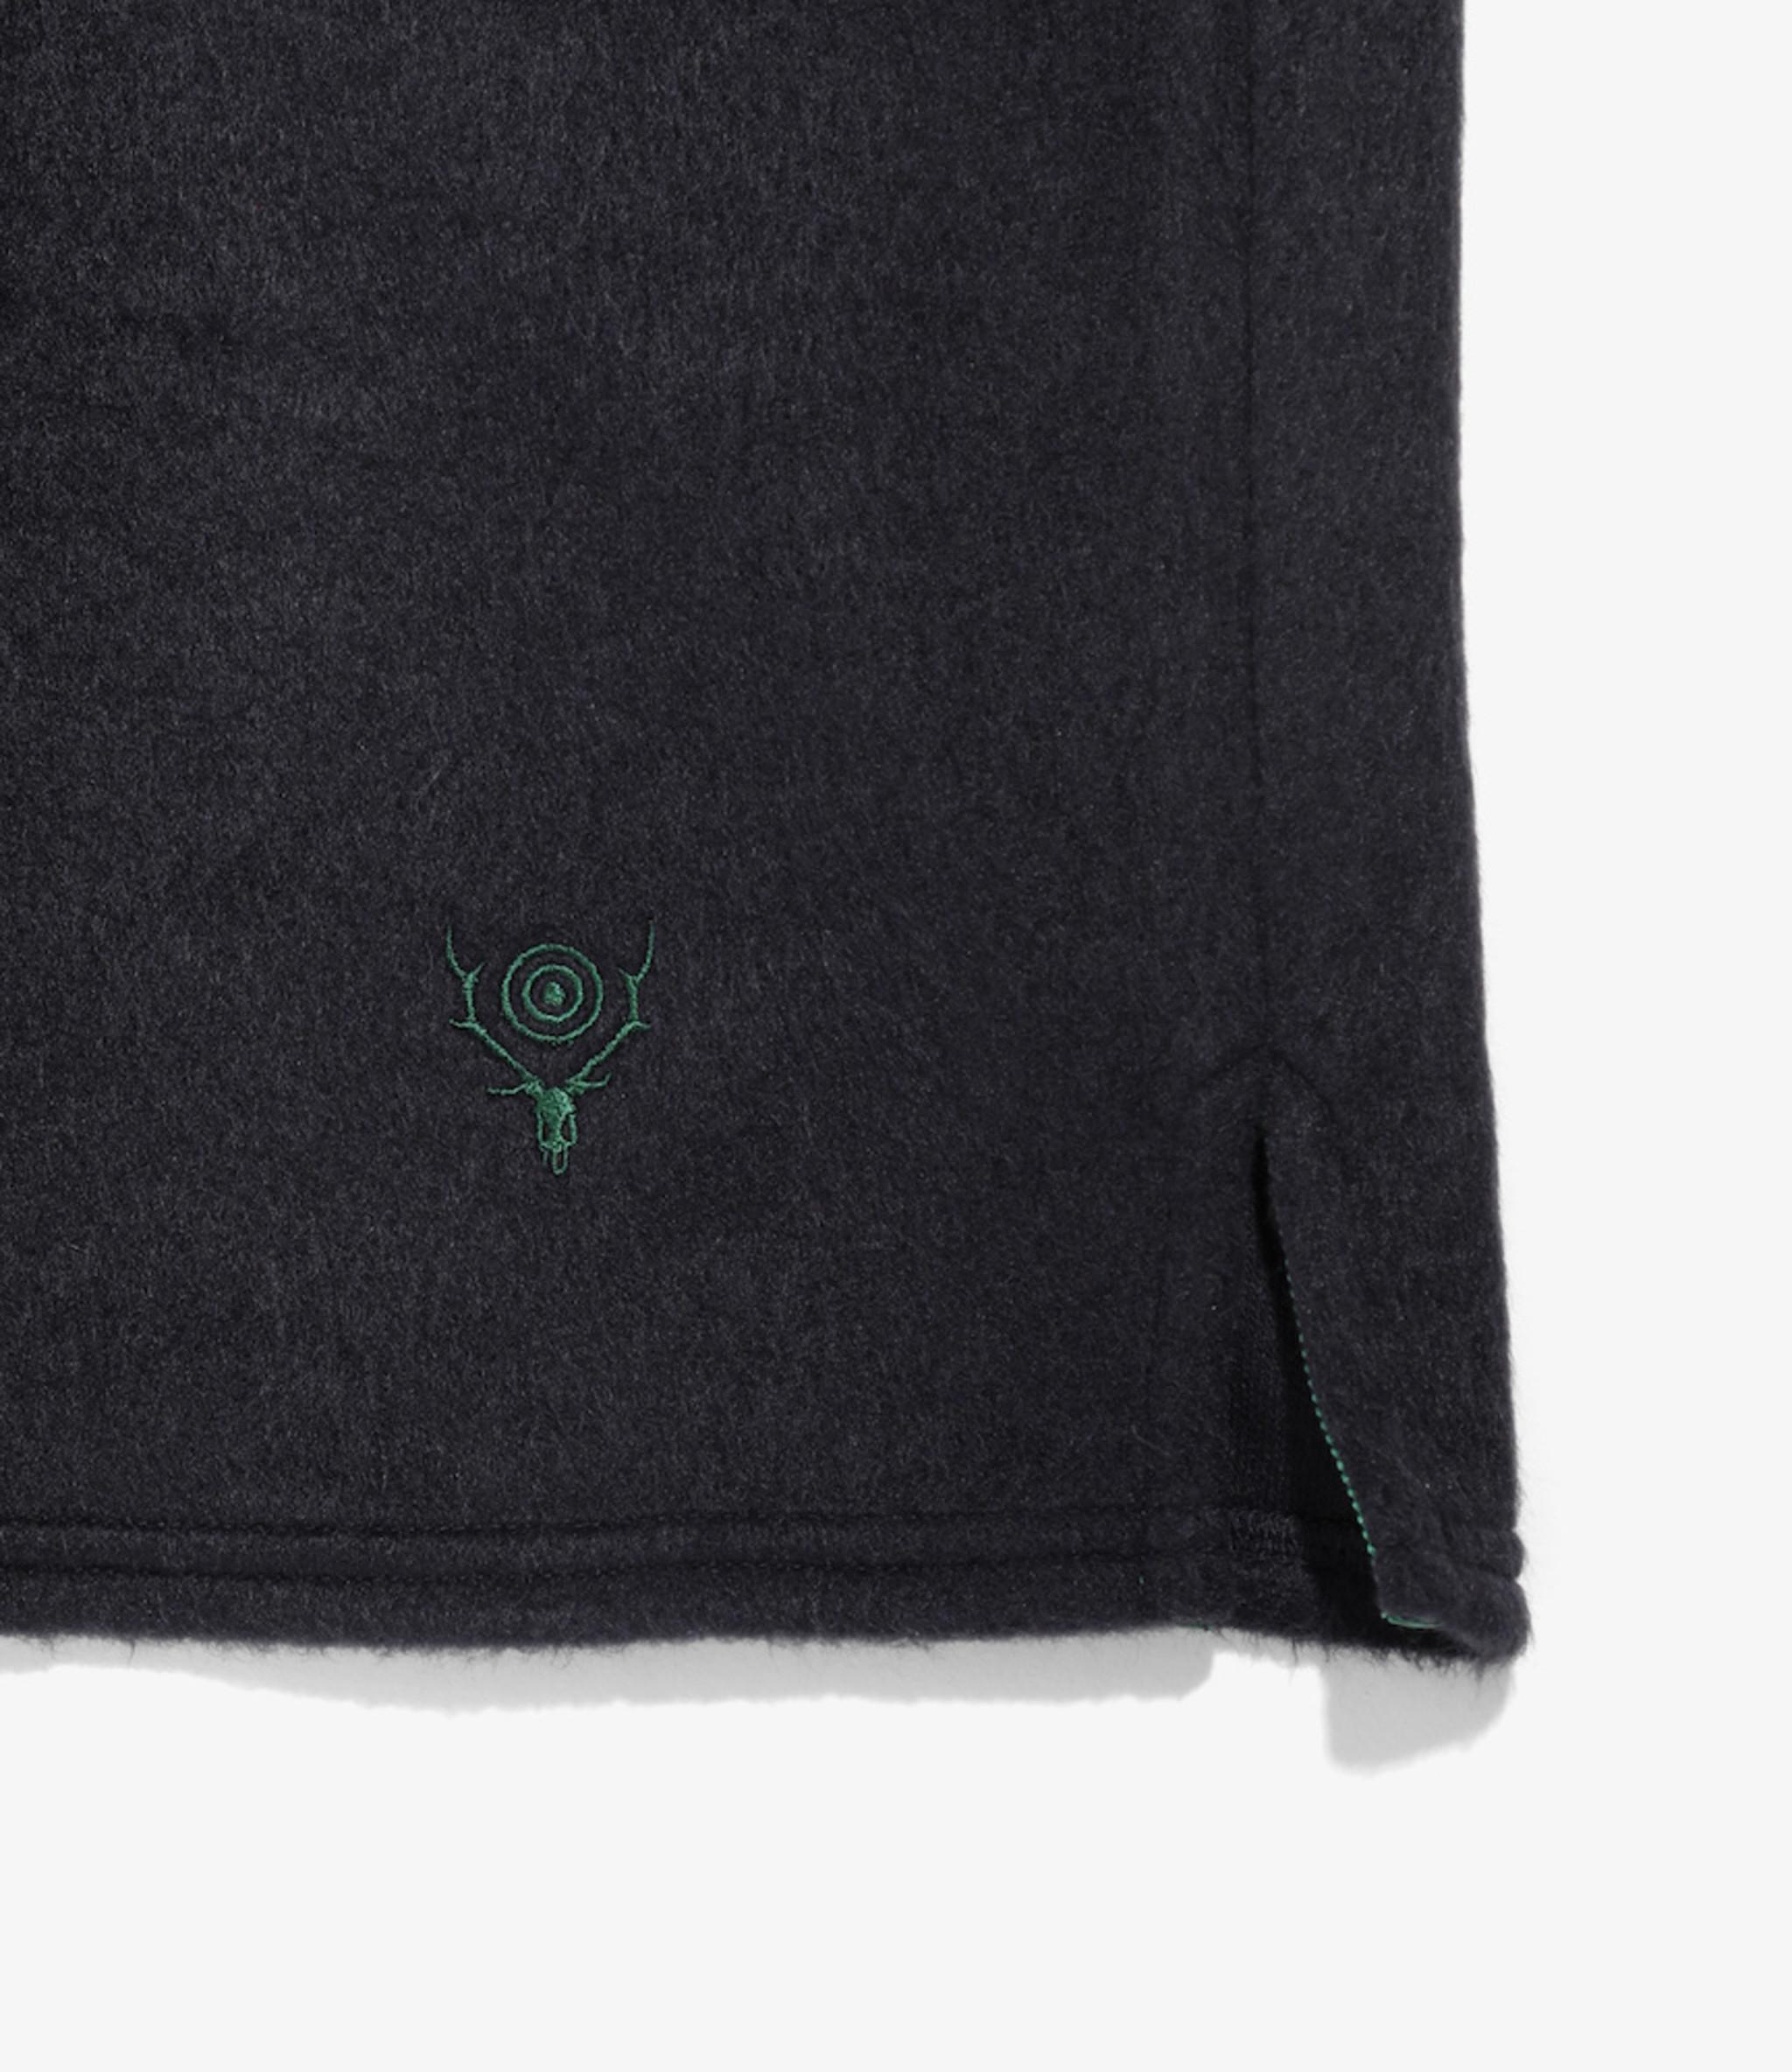 South2 West8 S.S. V Neck Shirt - Shaggy Knit - Nvy